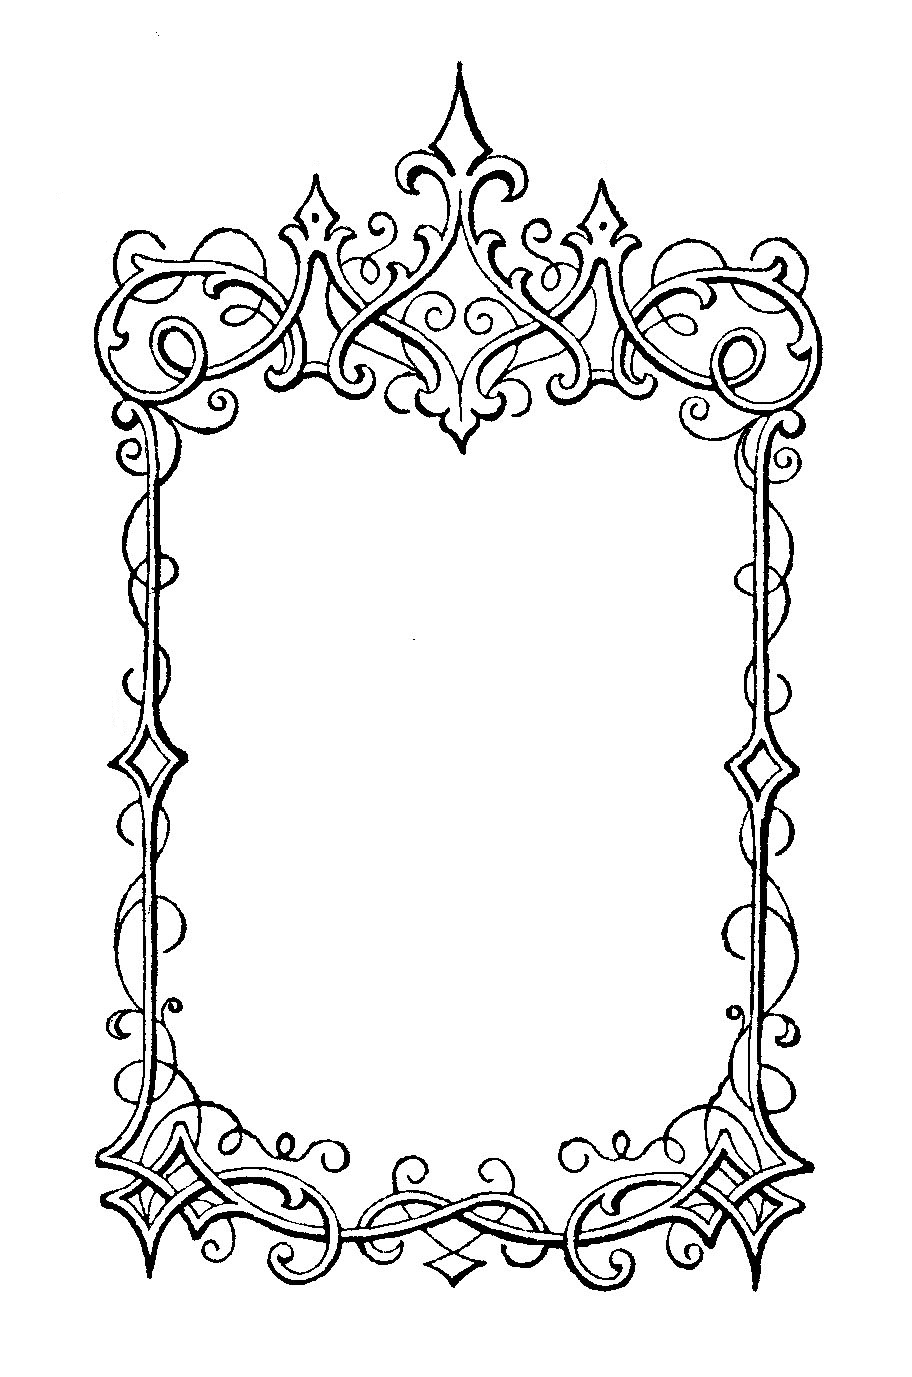 The Sum Of All Crafts: Elegant Frames